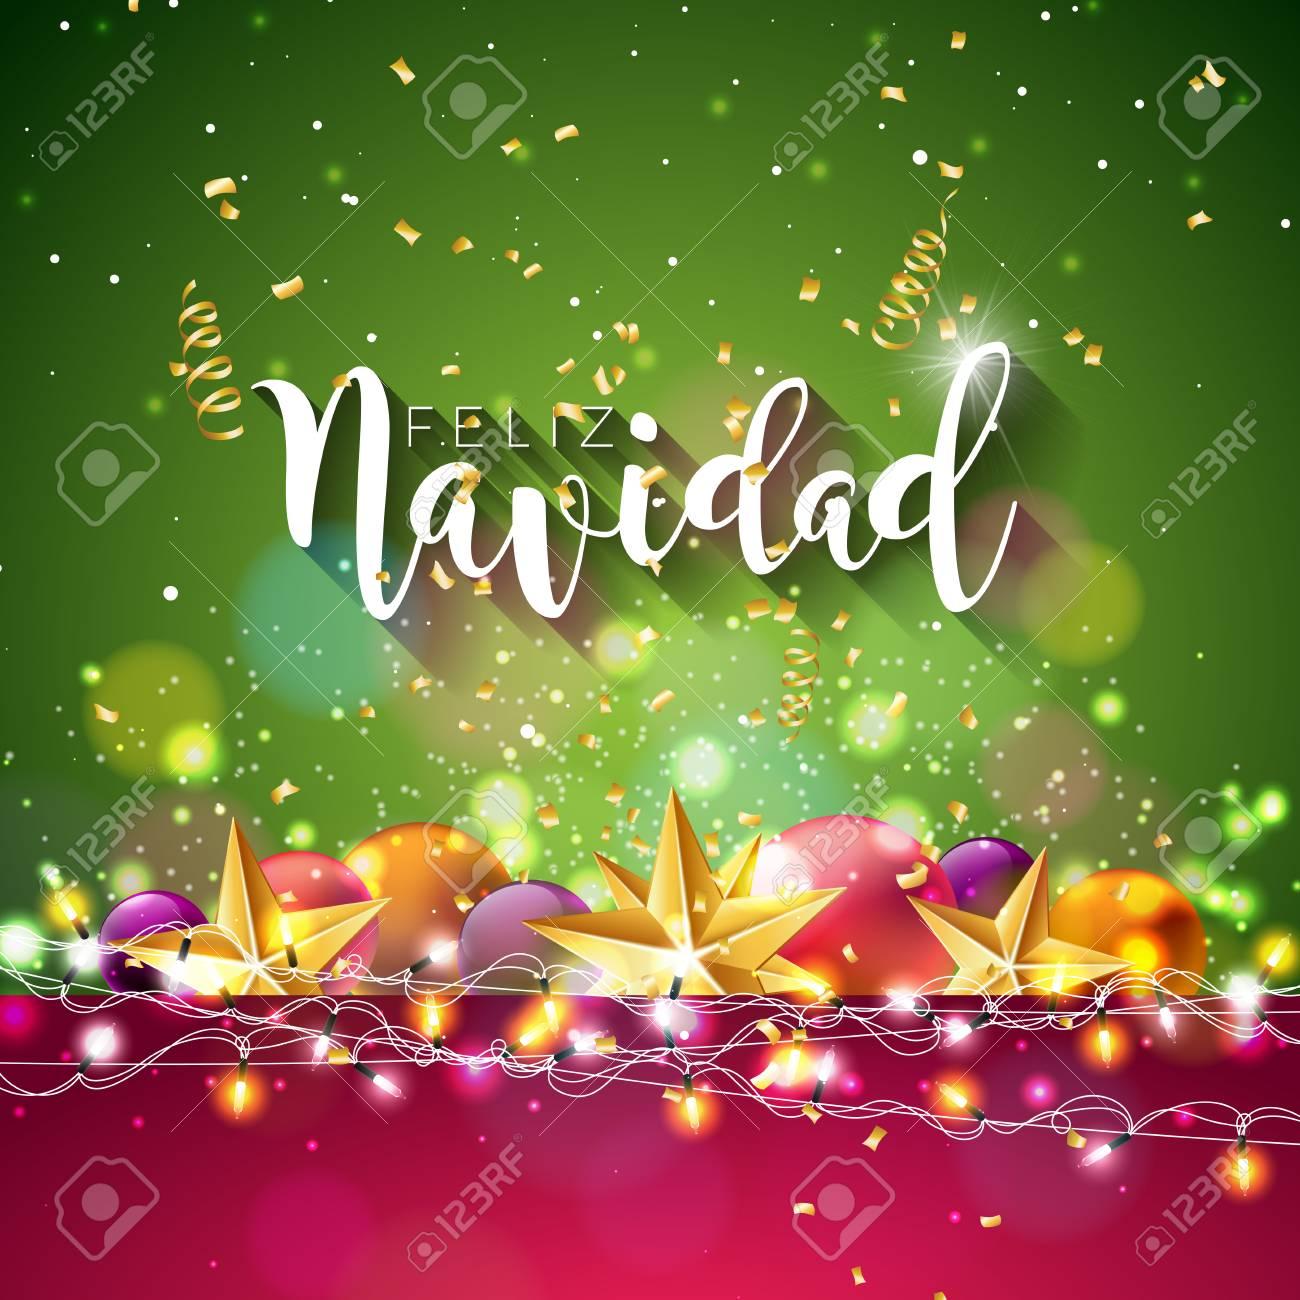 Christmas Illustration With Spanish Feliz Navidad Typography